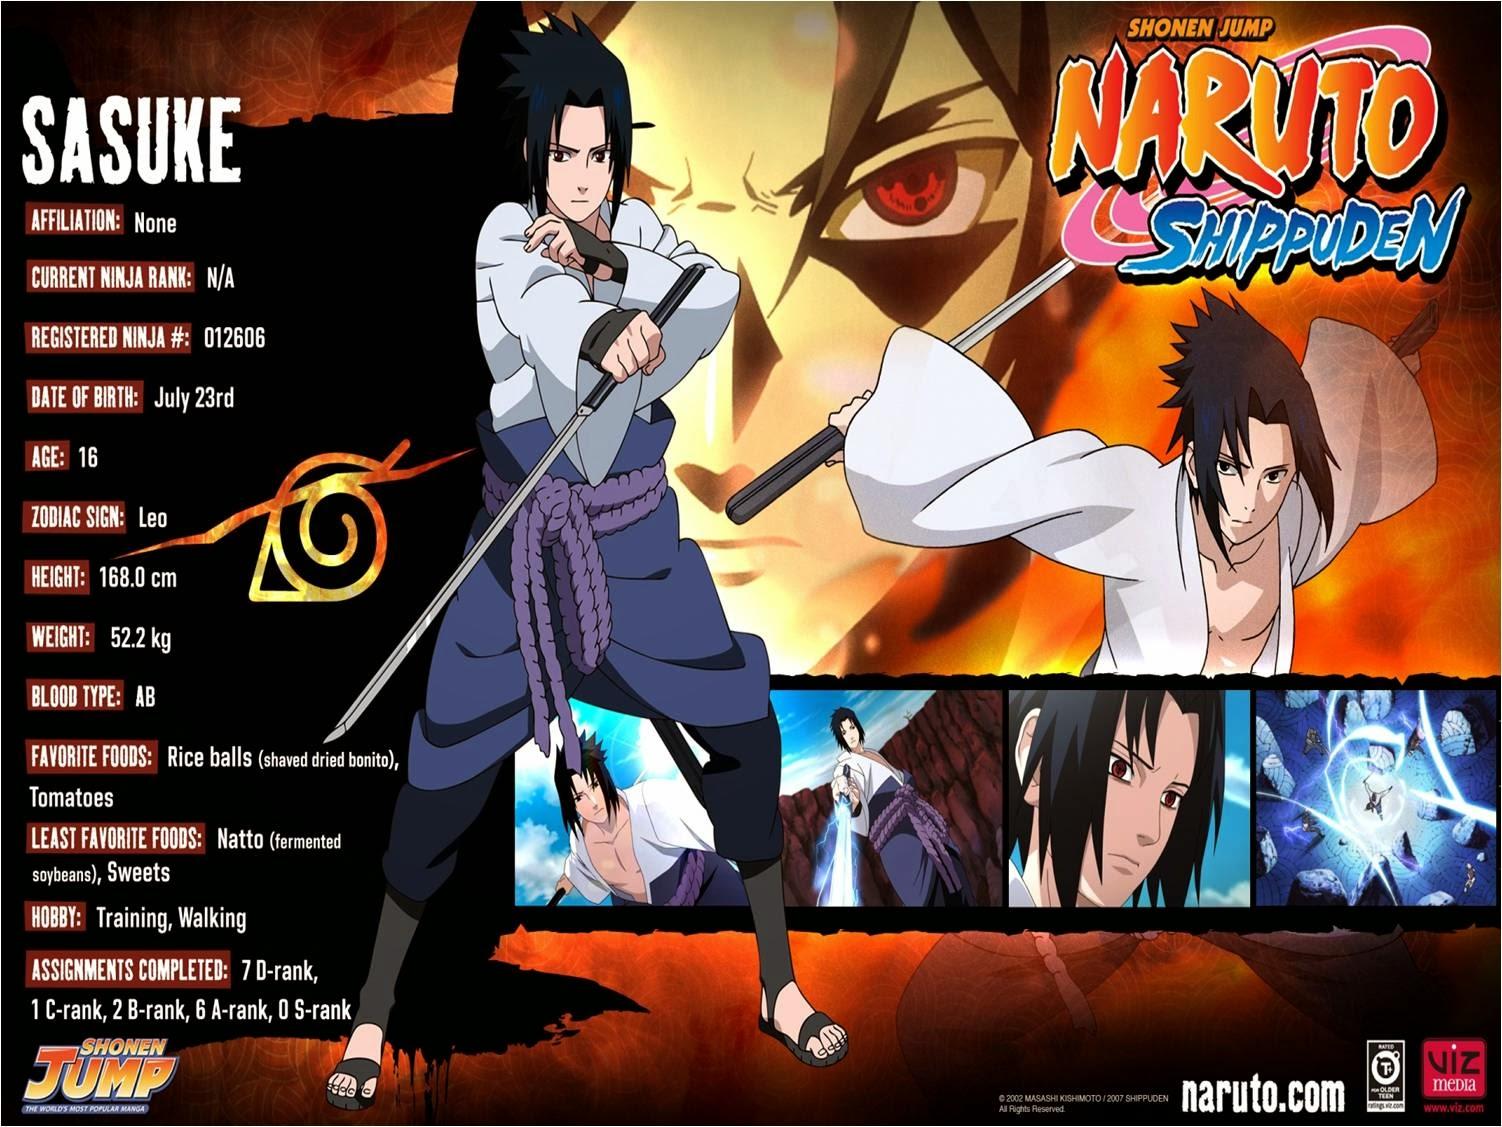 Naruto 371 Subbed